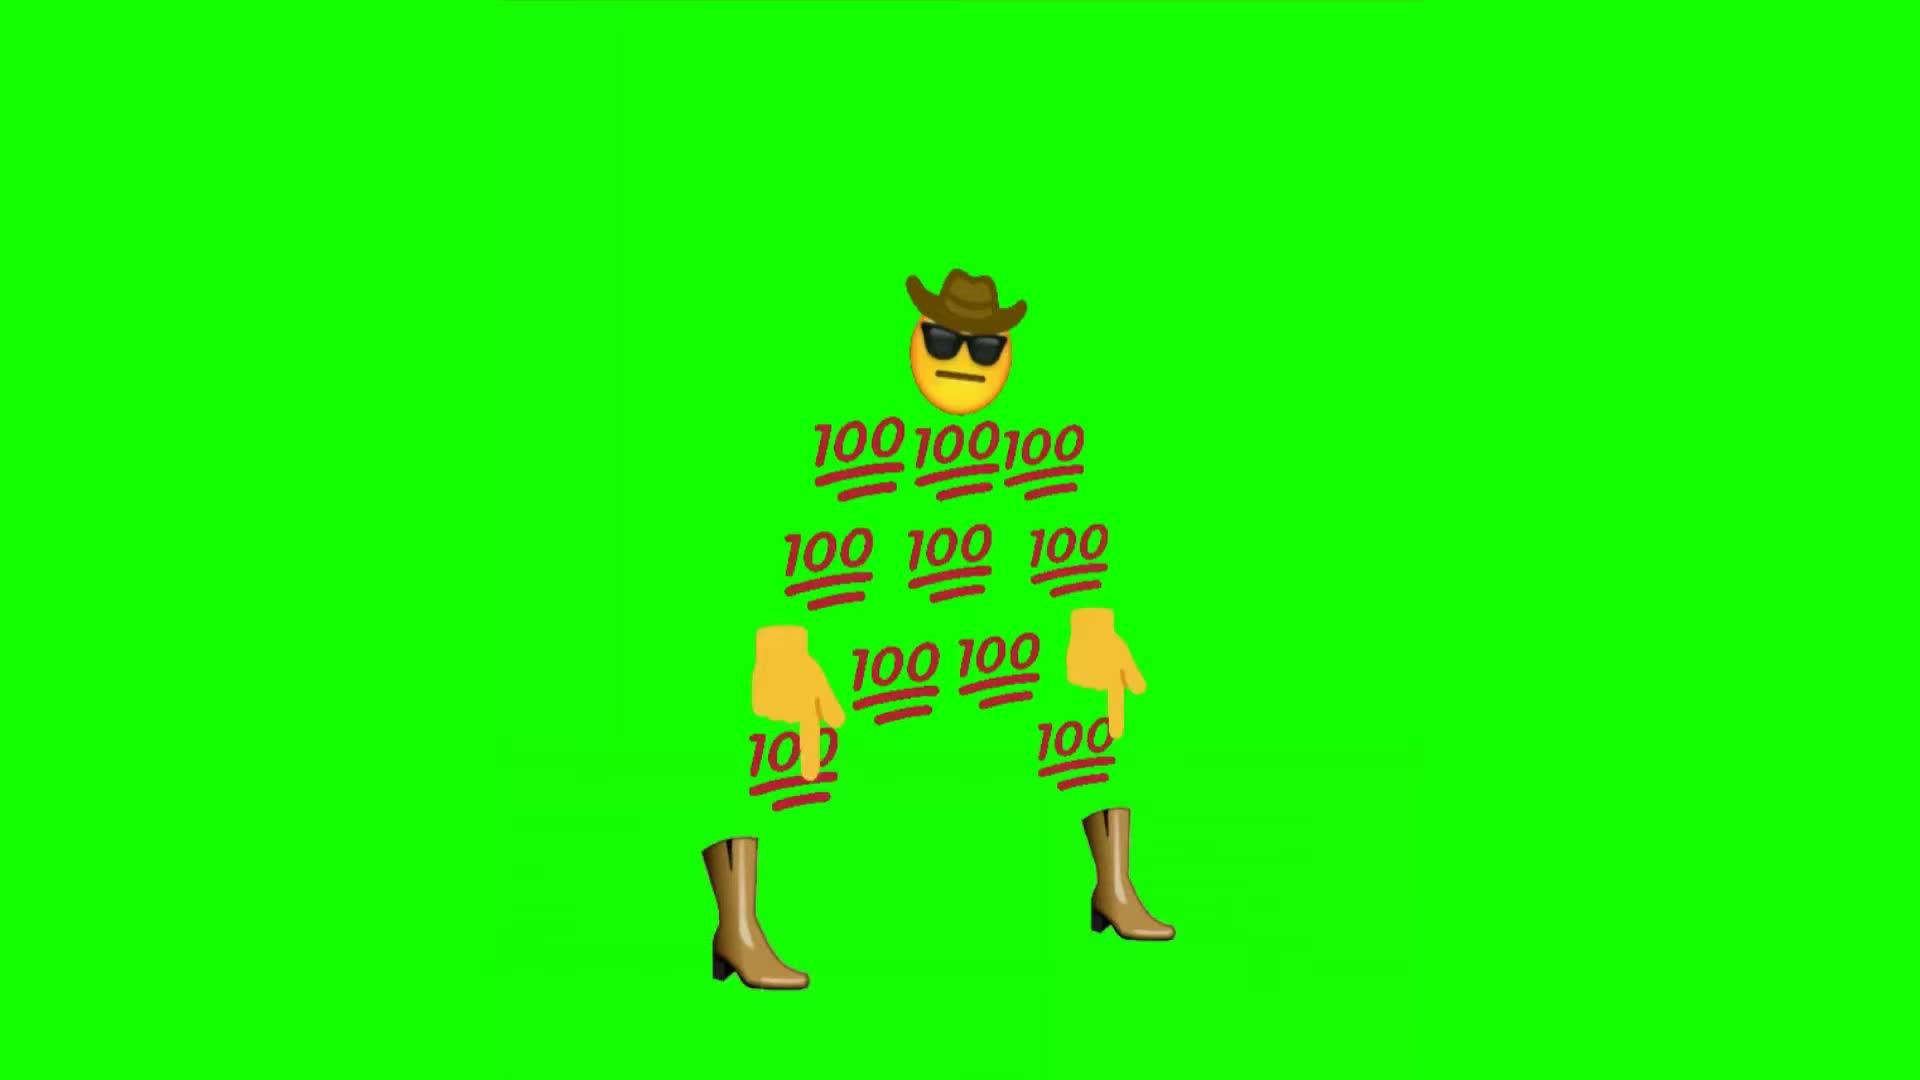 Cowboy Emoji Man Fortnite Default Dancing Free Greenscreen DL IN DESC